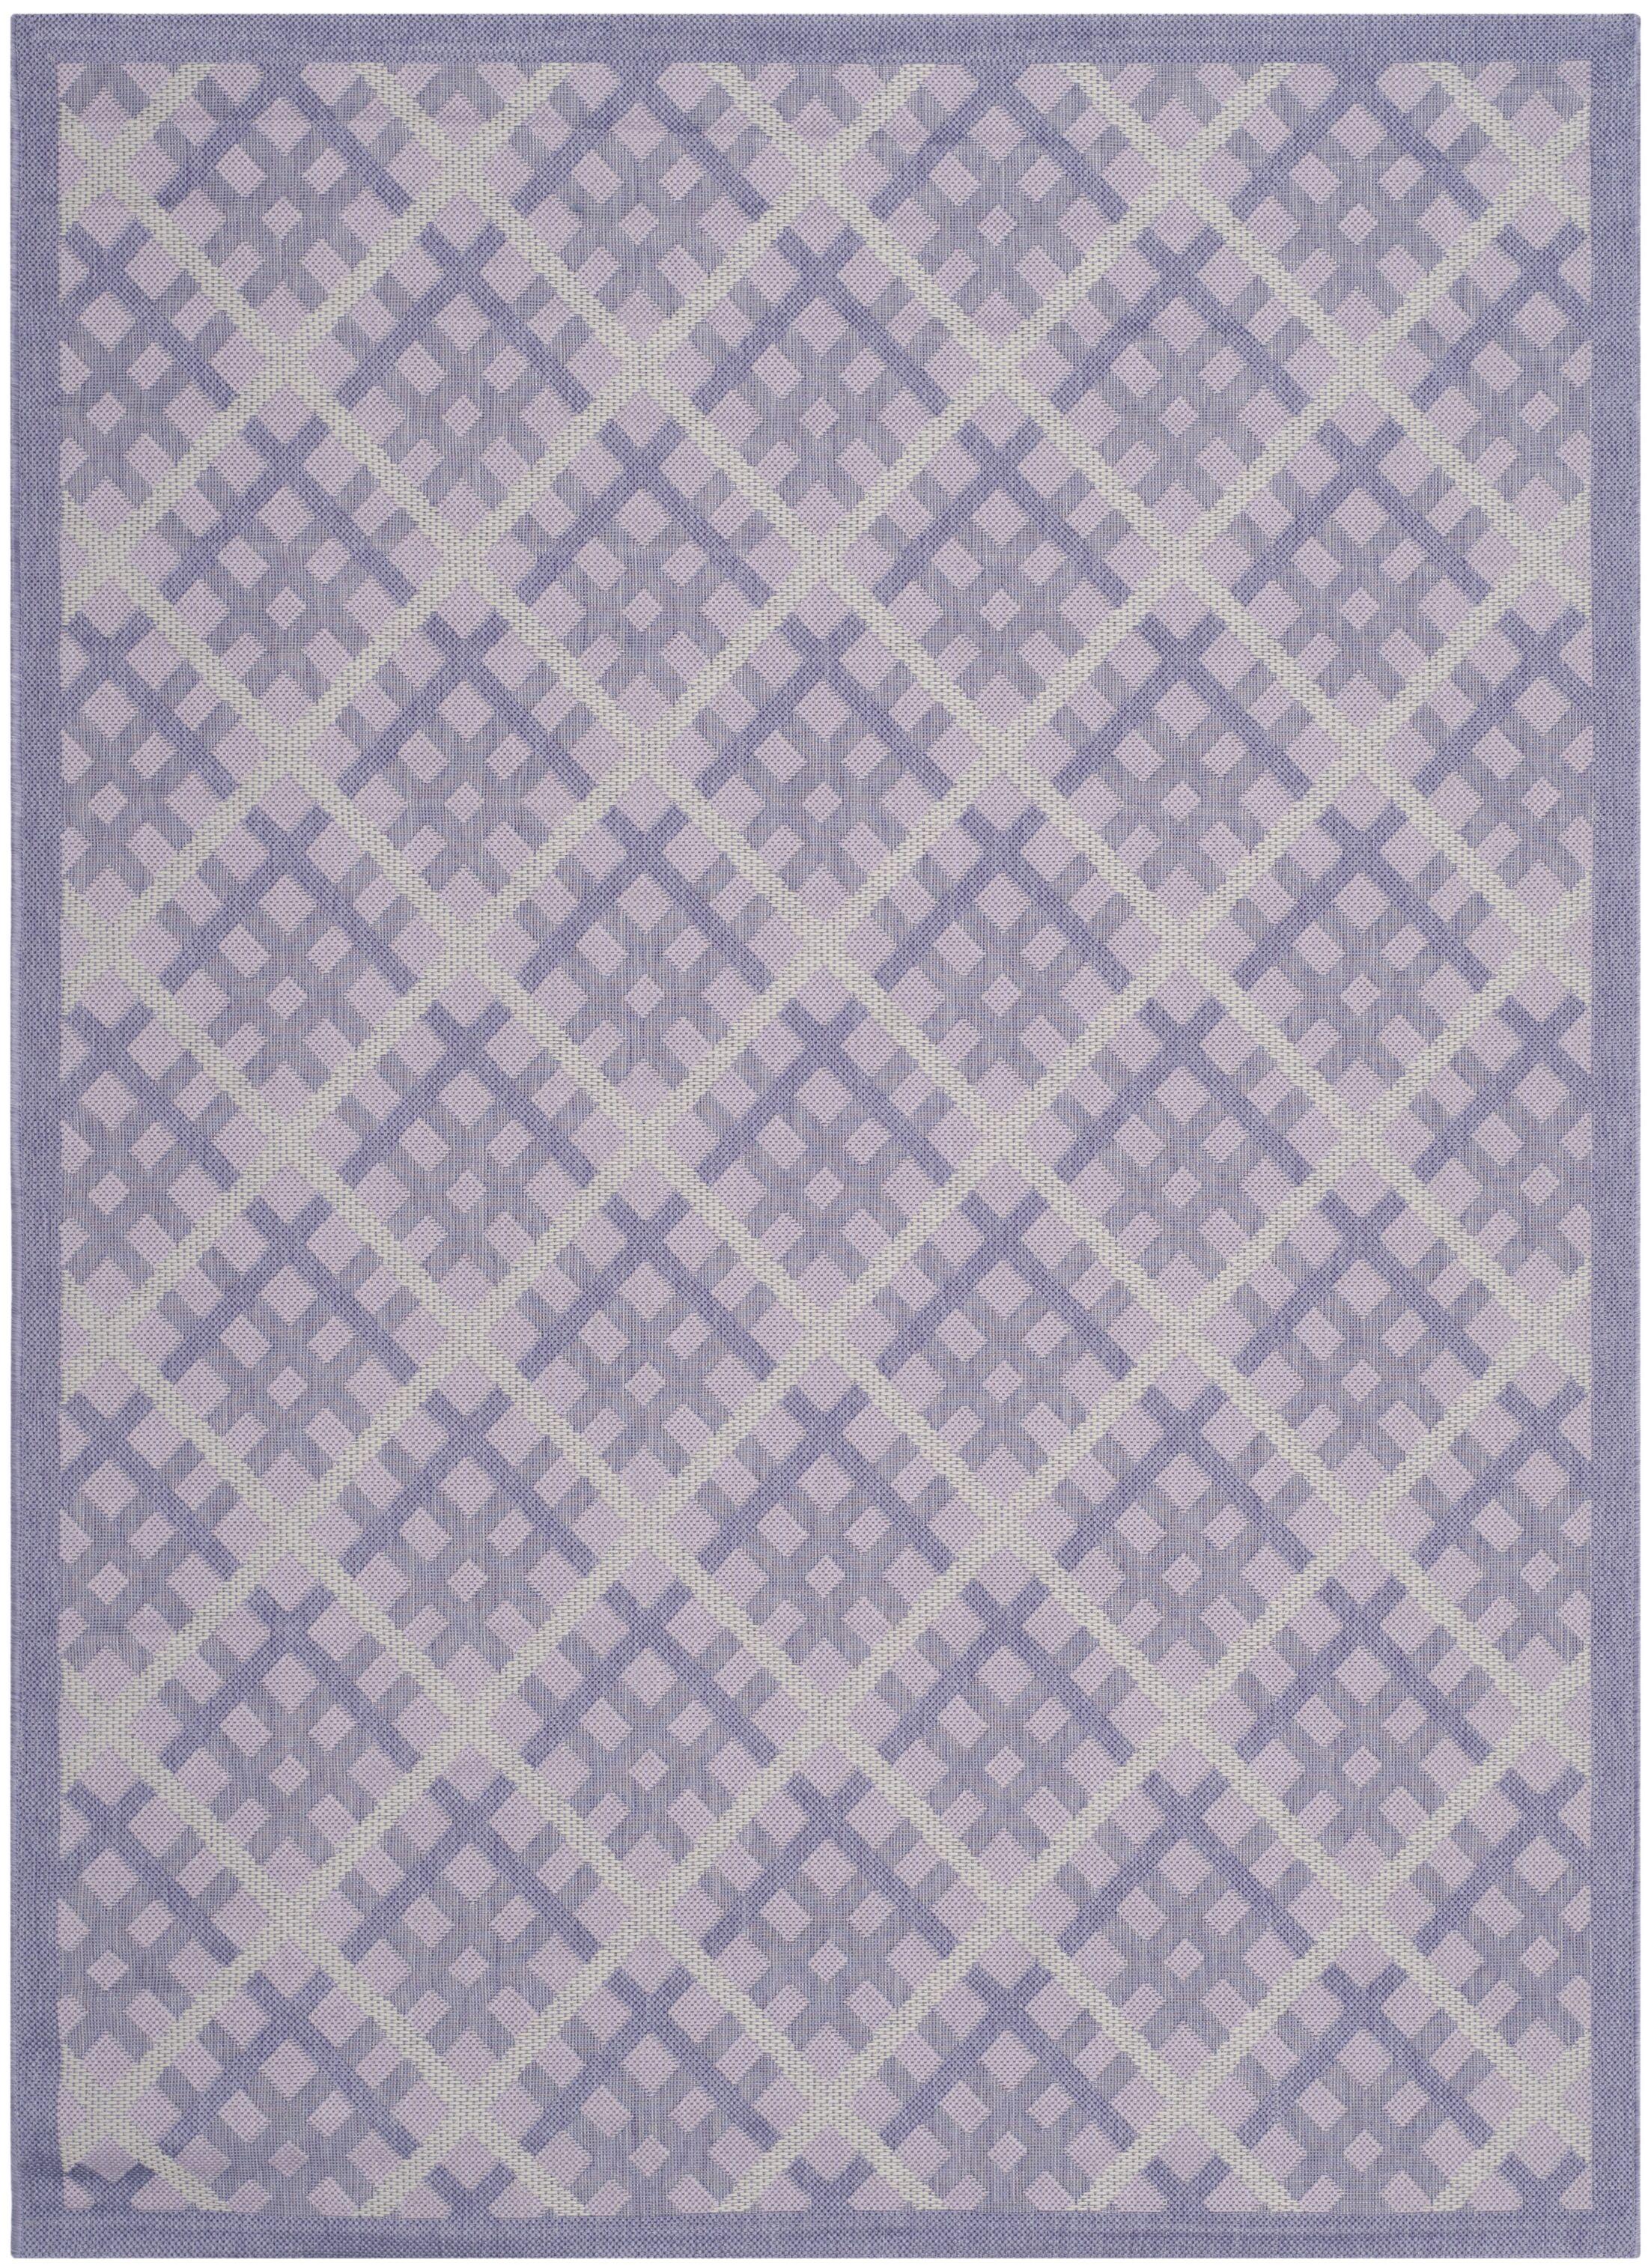 Laurel Lilac / Dark Lilac Indoor/Outdoor Rug Rug Size: Rectangle 5'3